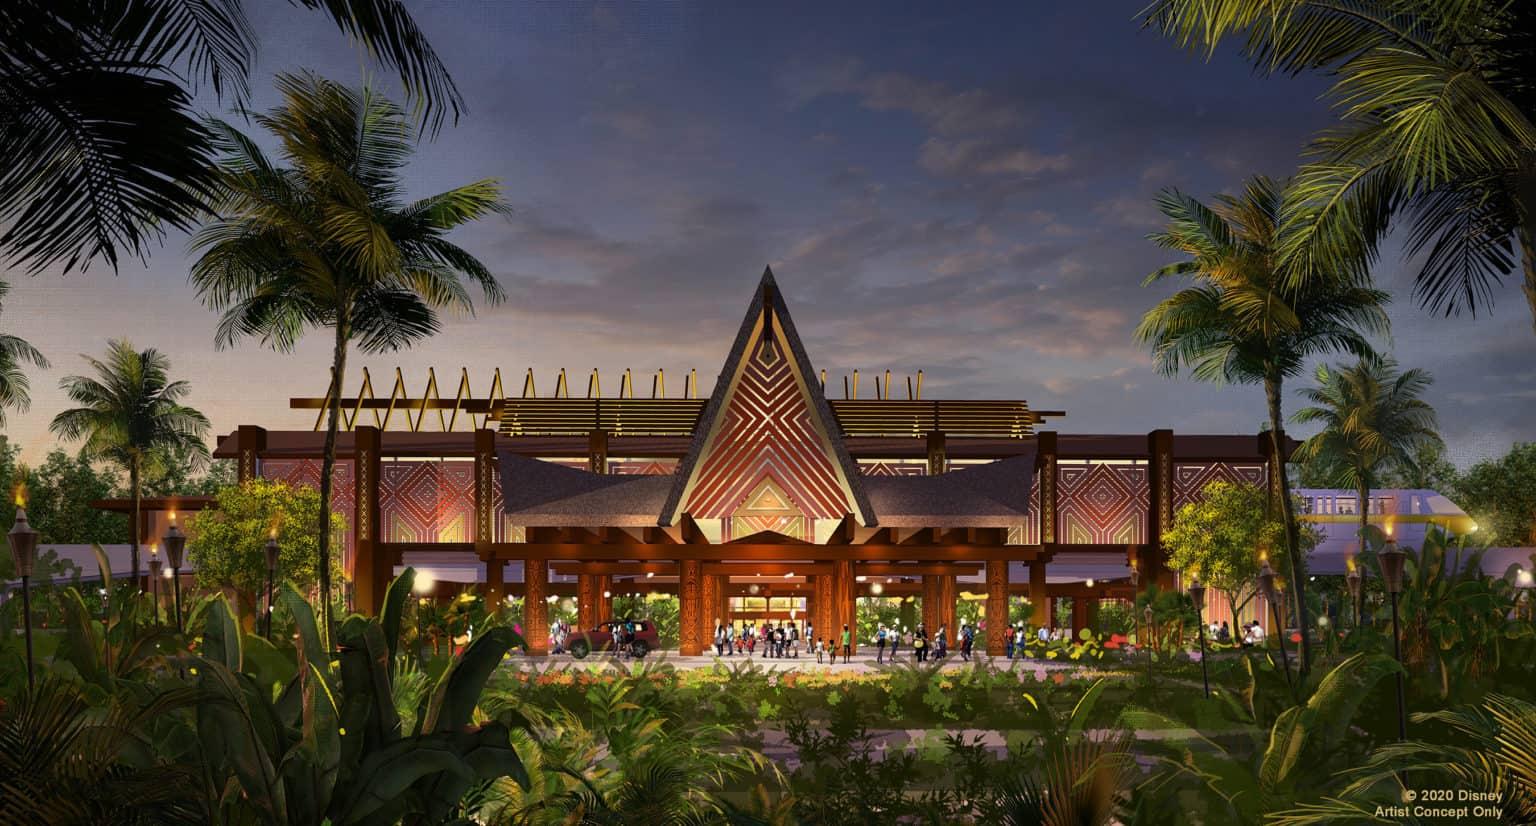 Inside the Moana Rooms at Disney's Polynesian Village Resort 5